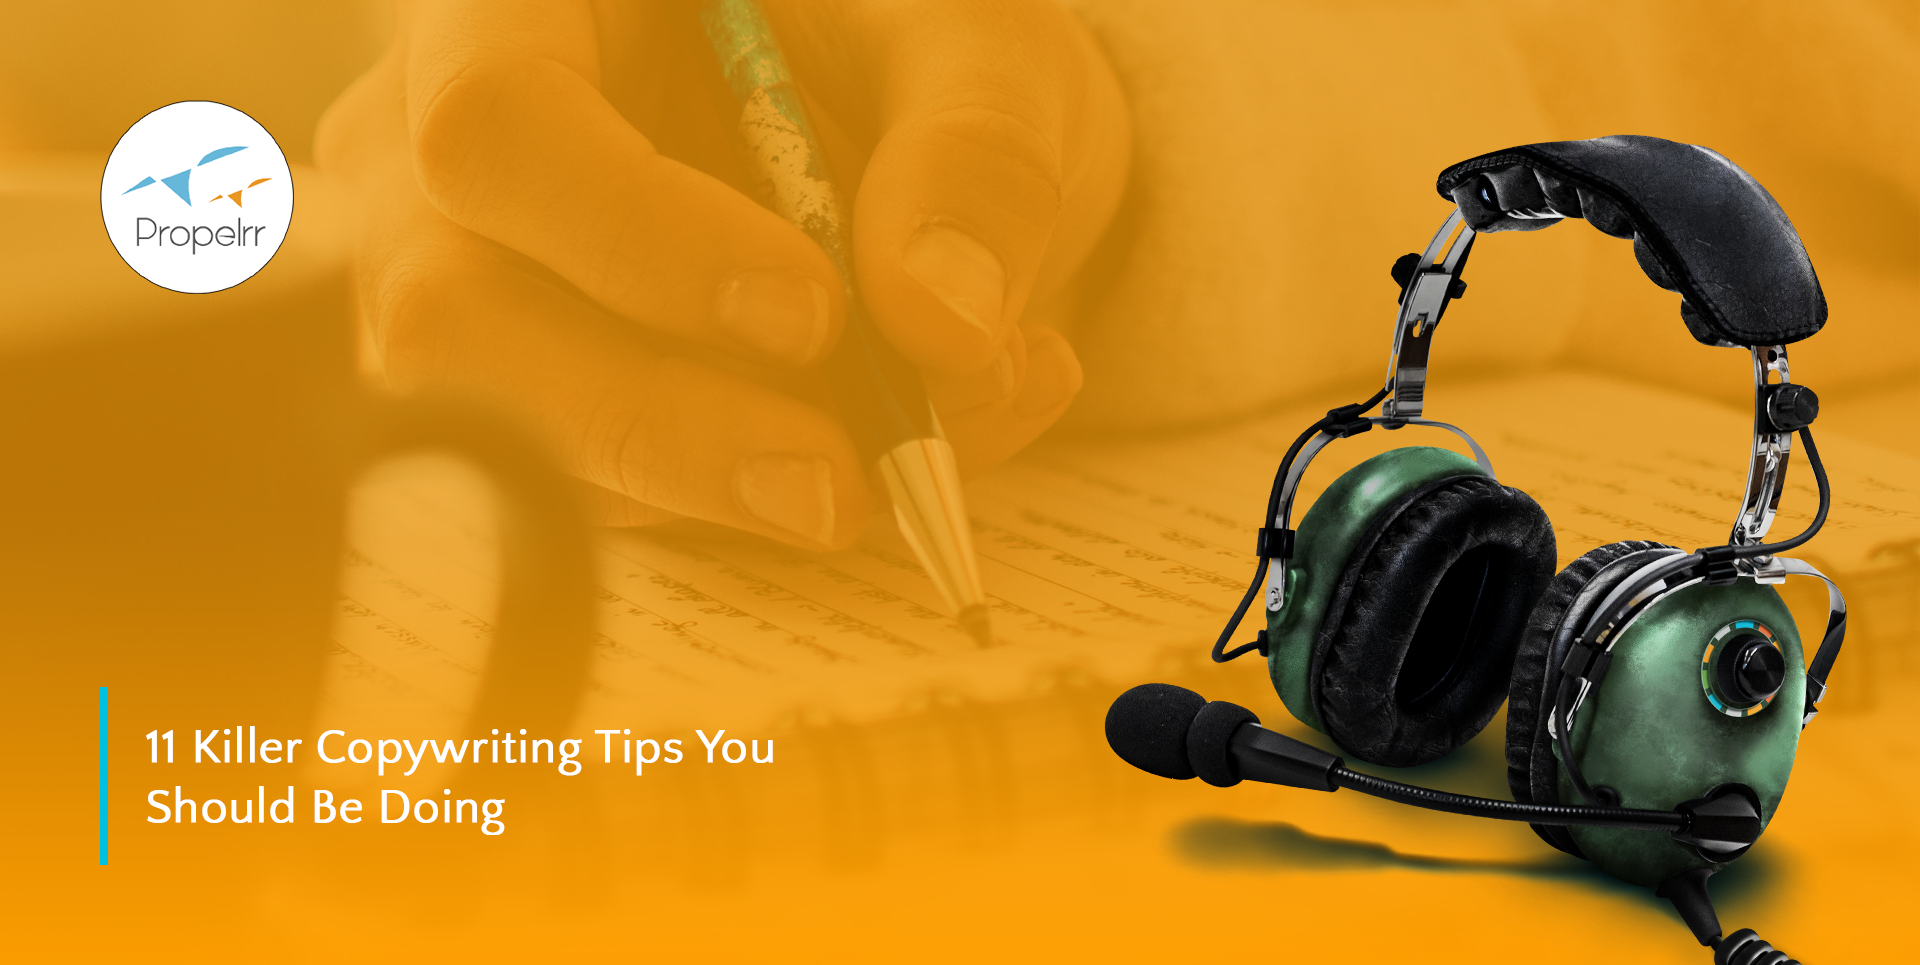 11 Killer Copywriting Tips You Should Be Doing